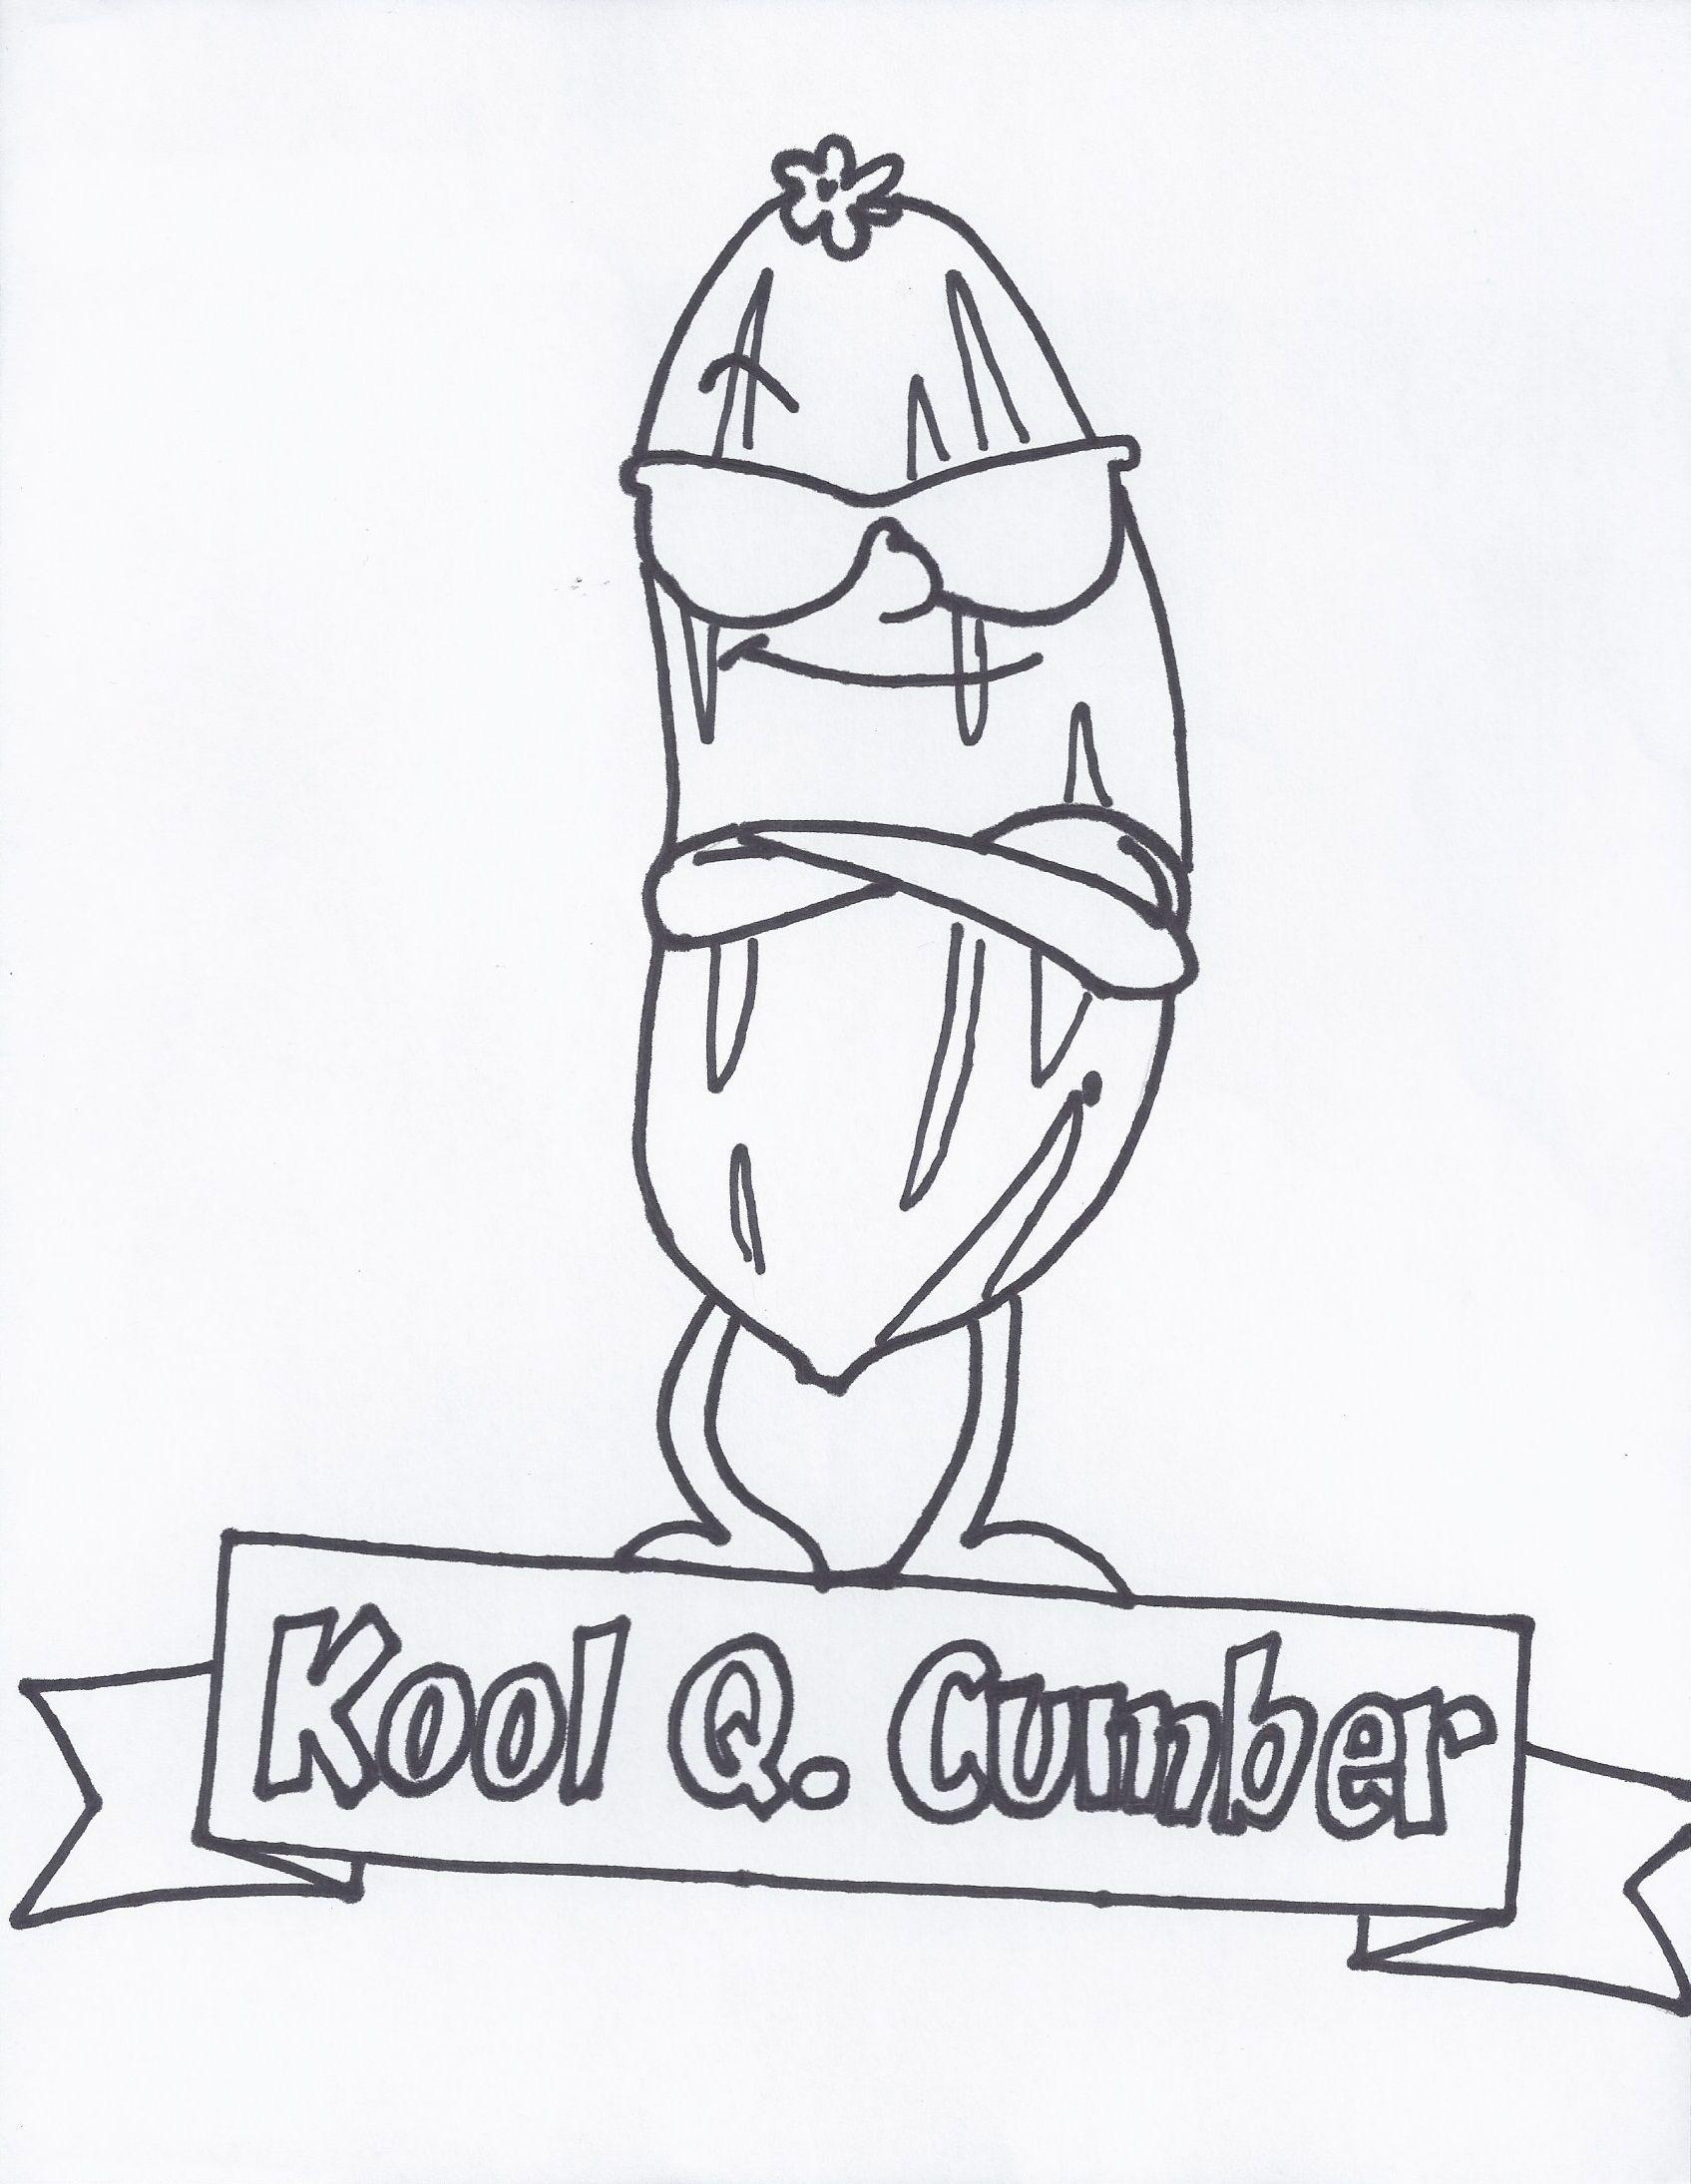 Kool Q Cumber I Help You Stay Calm Cool As A Cucumber